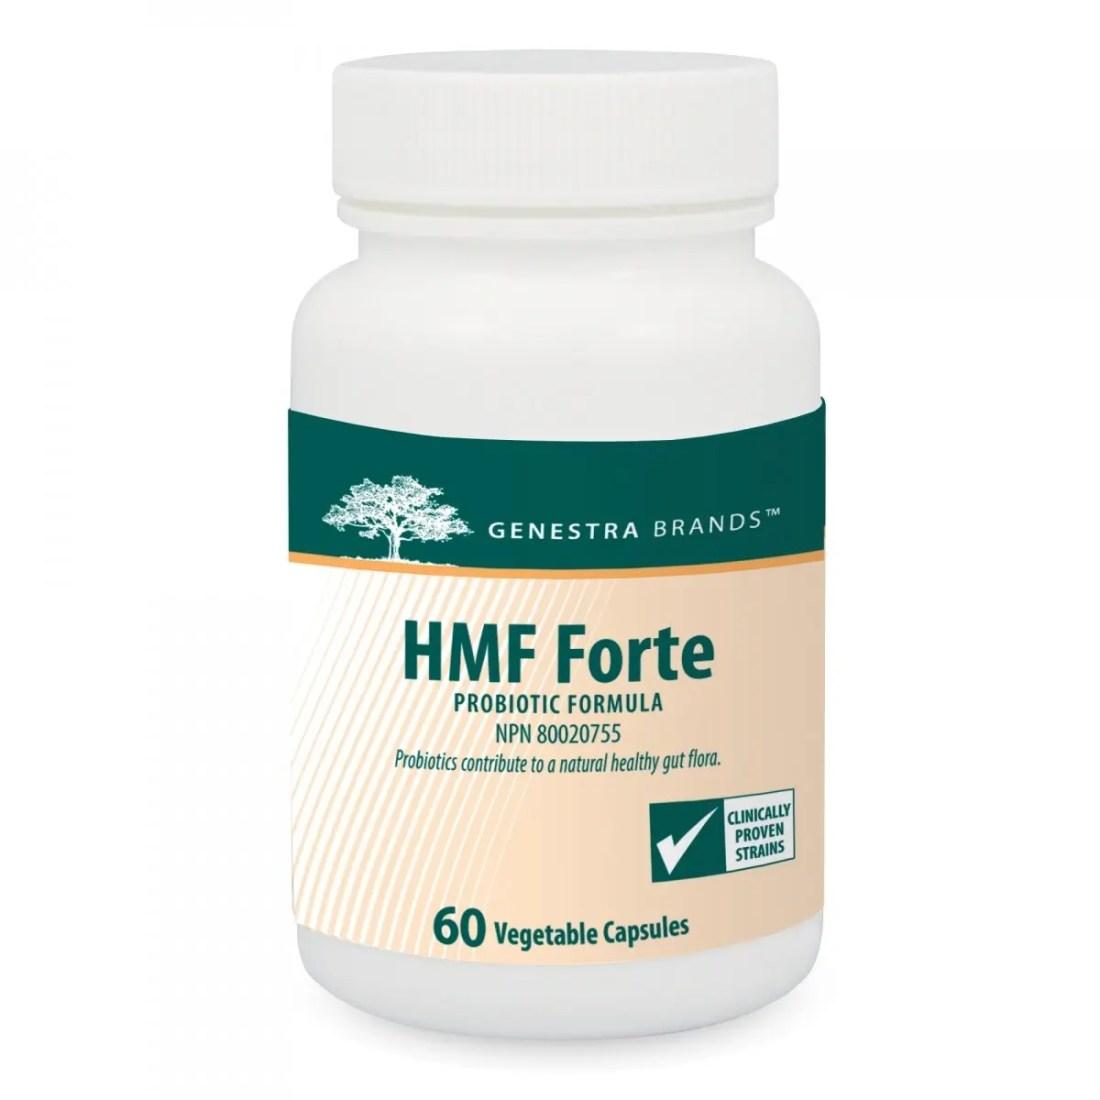 HMF Forte